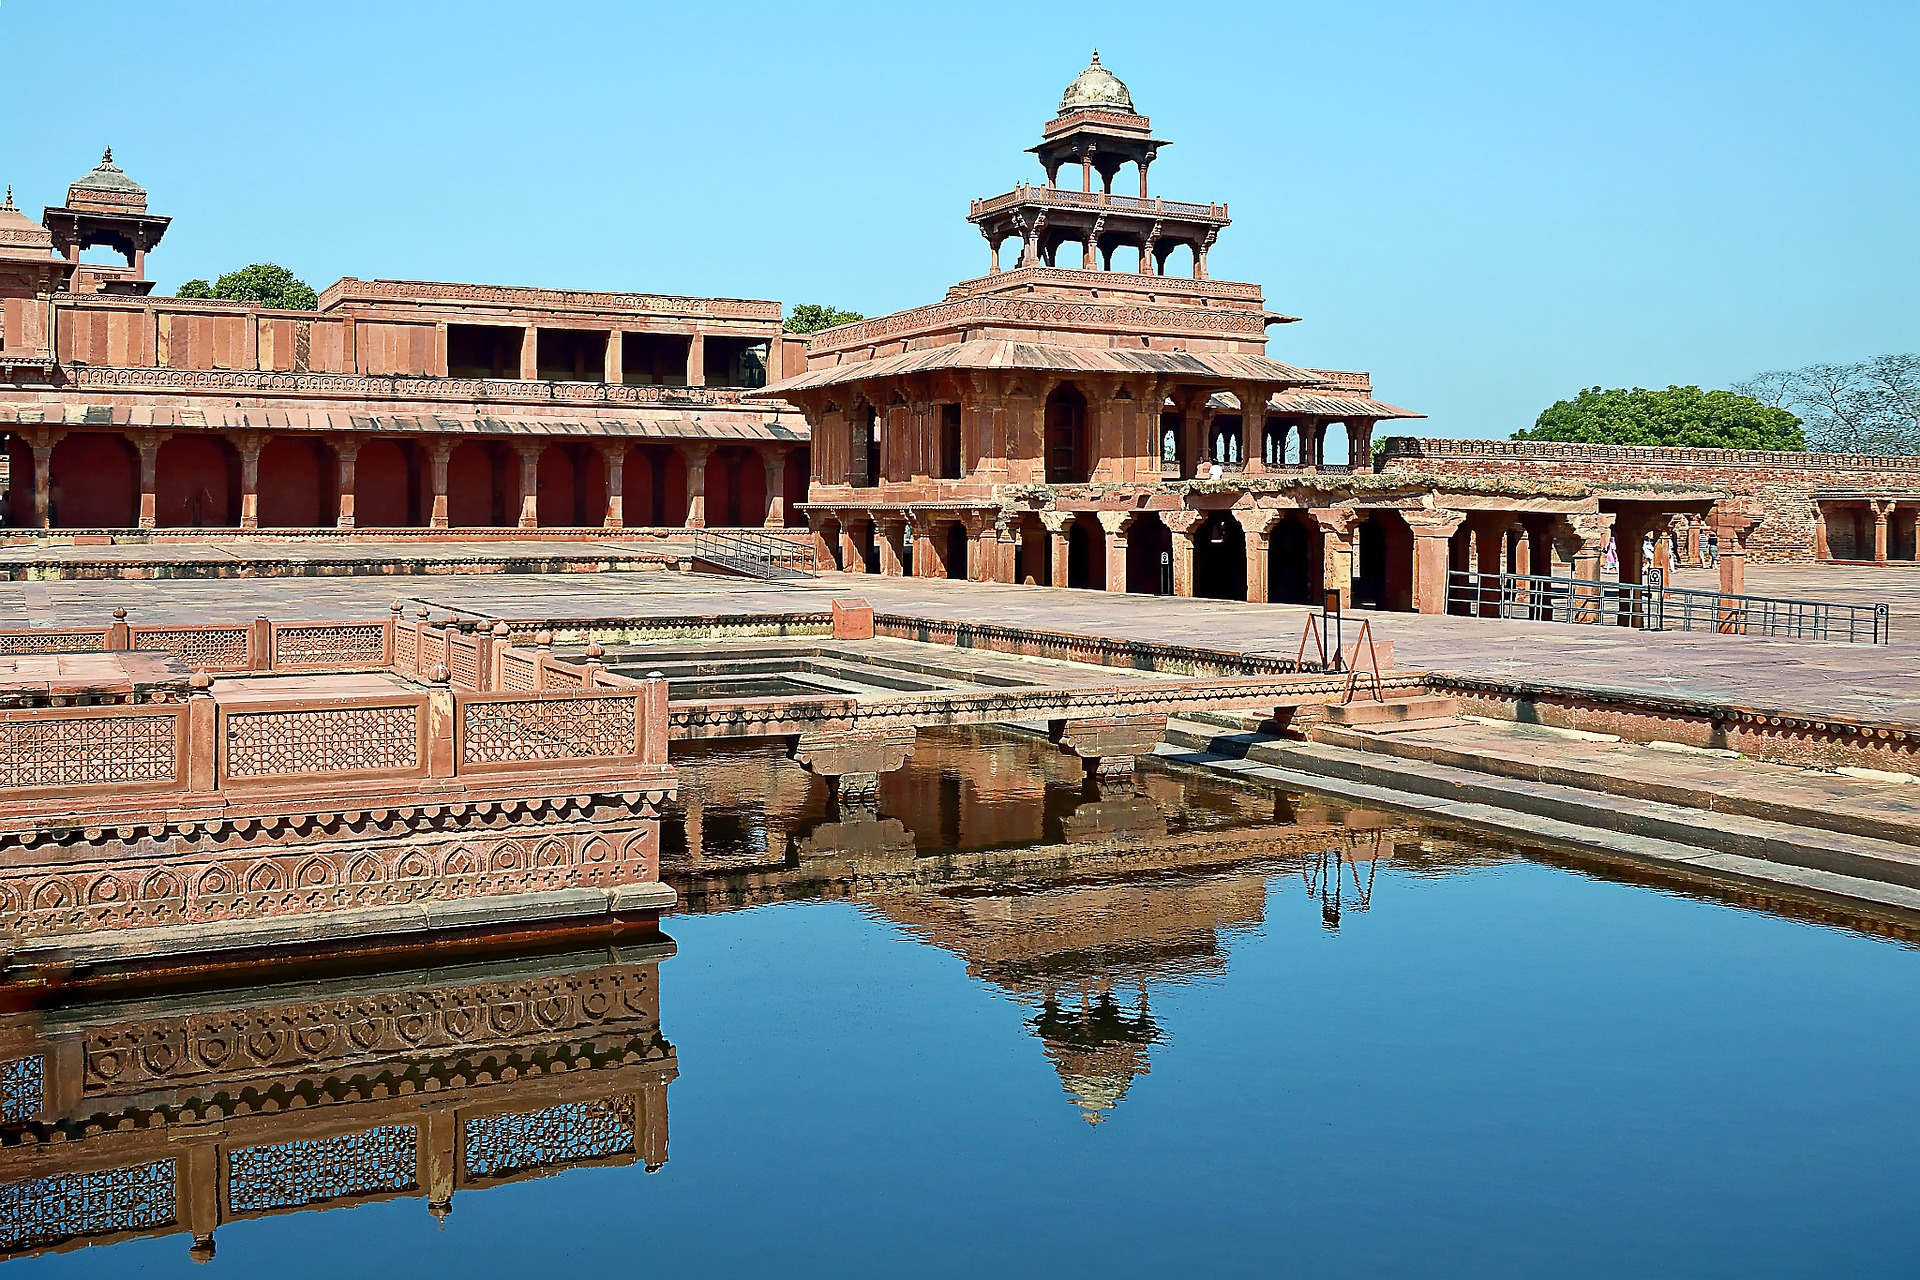 Fatehpur Sikri, Tempel, Ruinen, Wasser, Indien